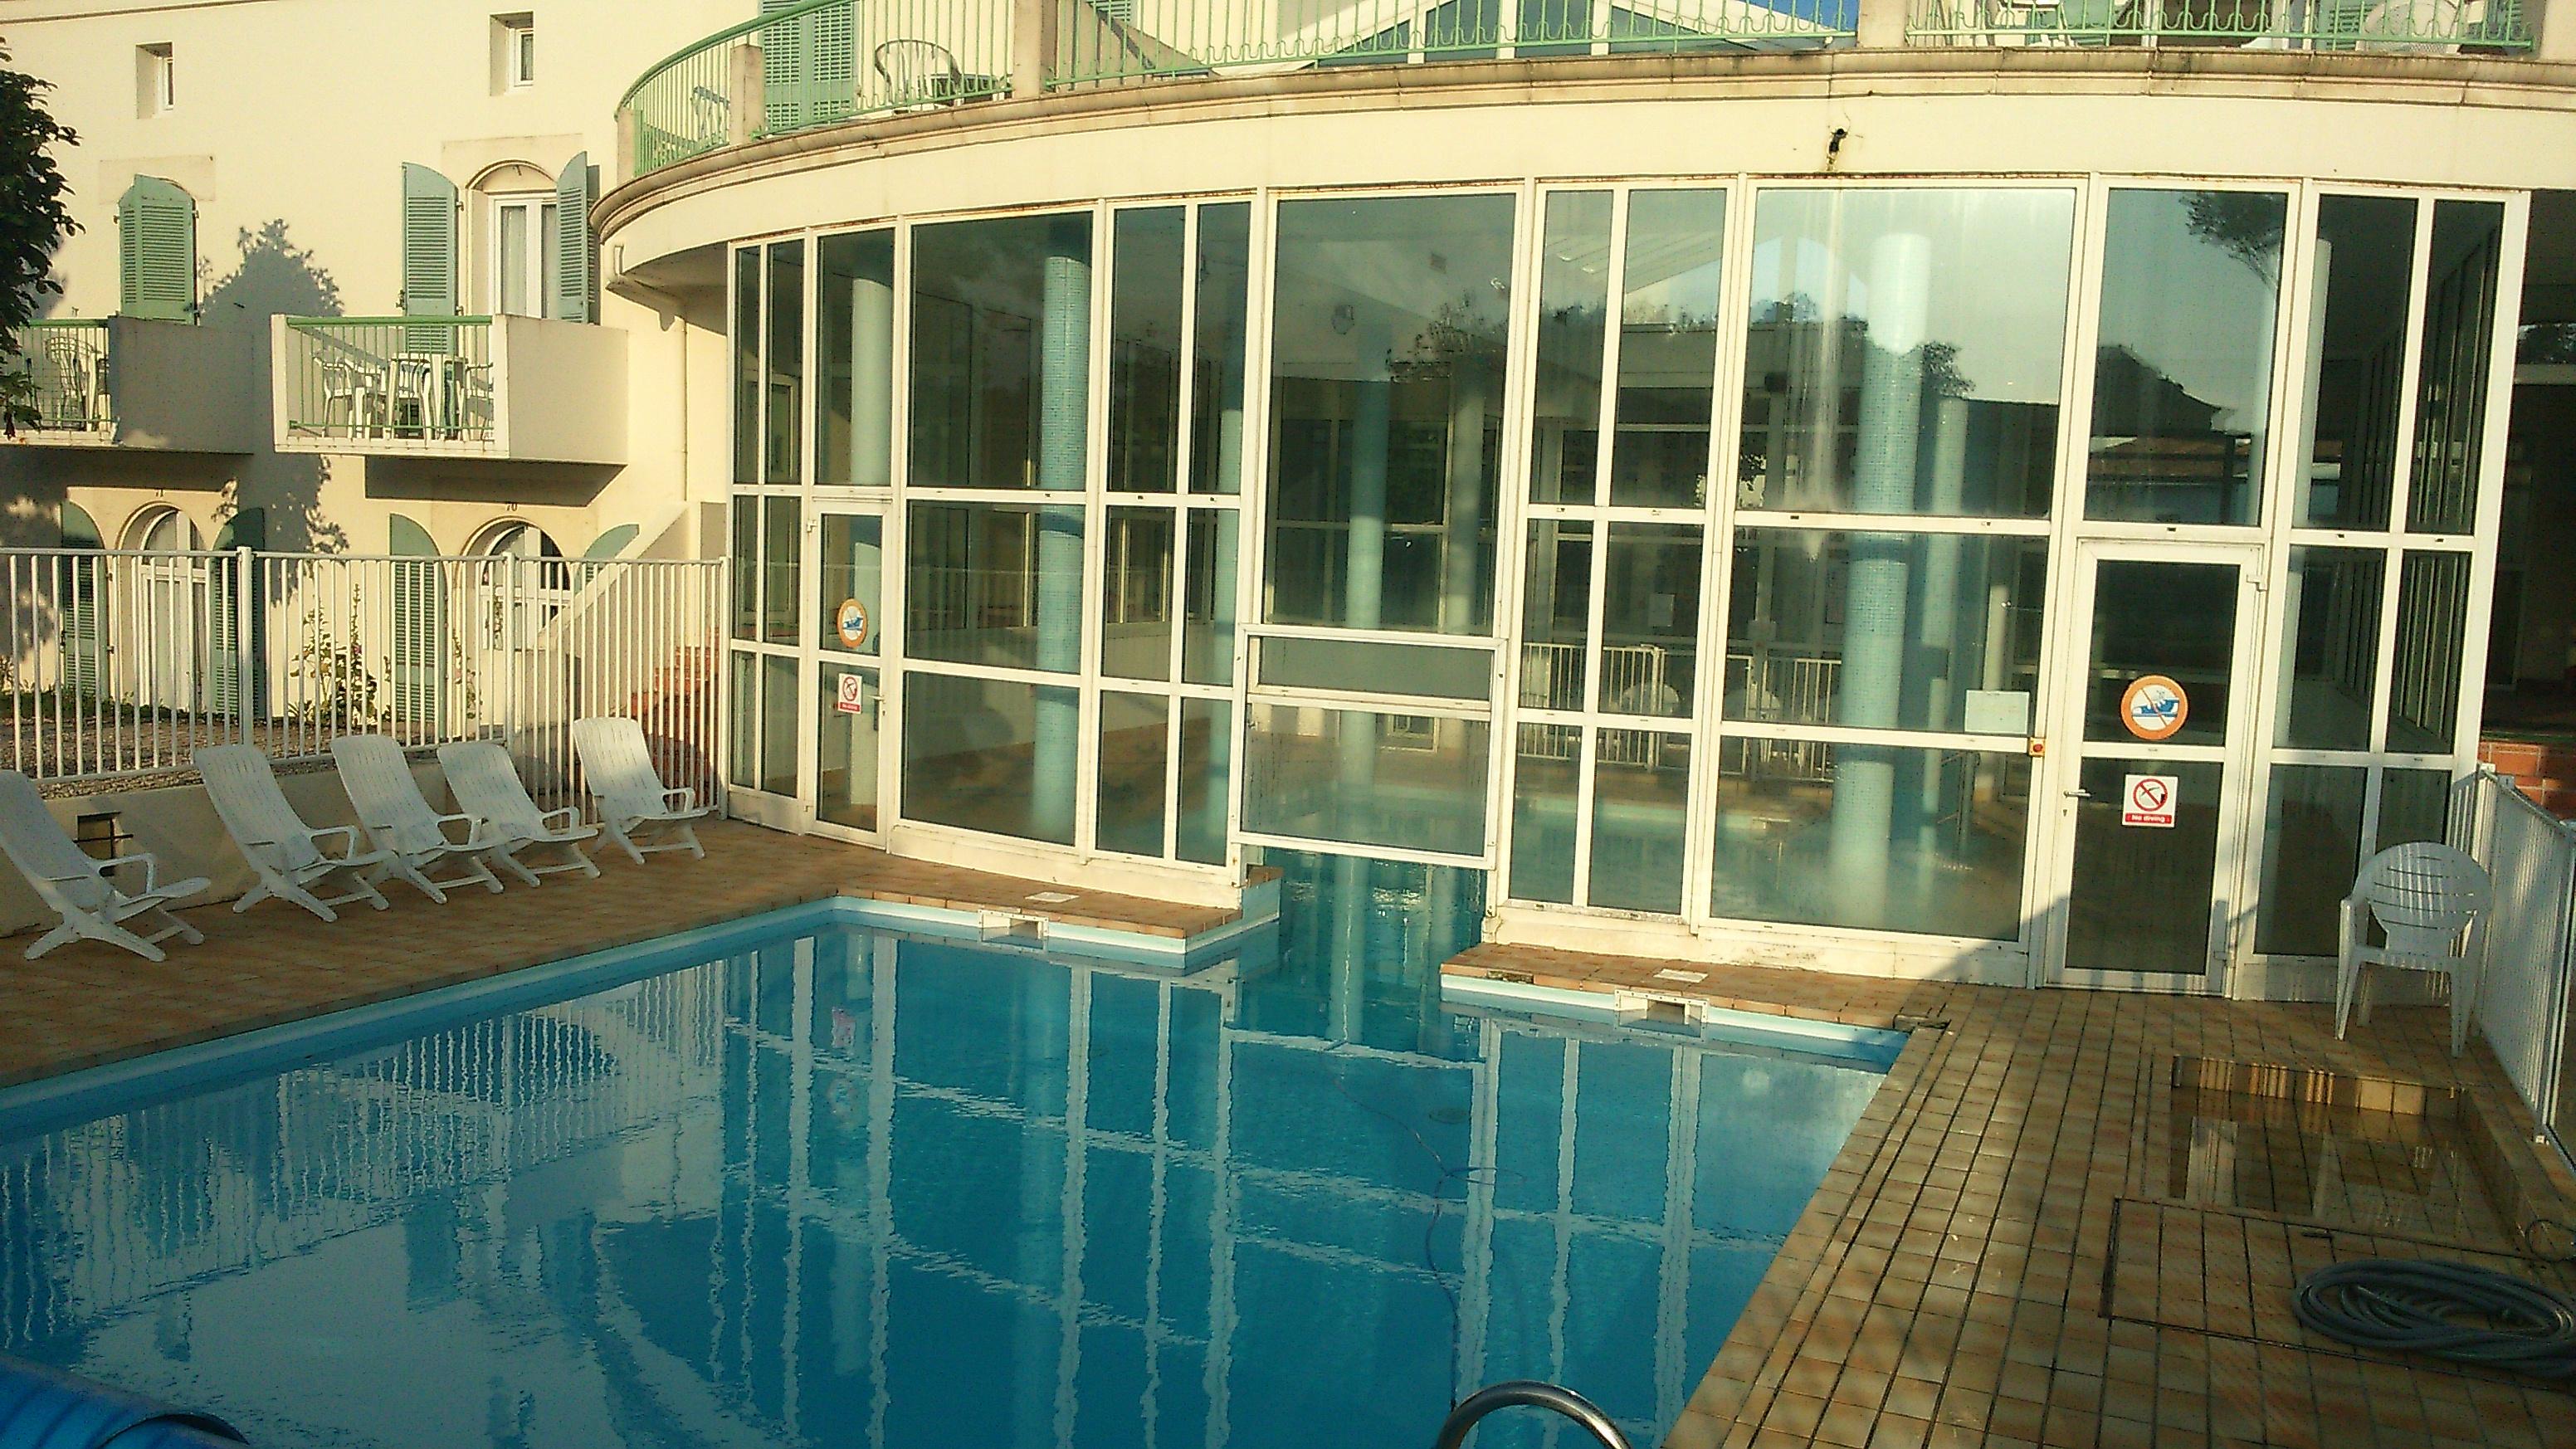 location ile de r saint martin de r f2 avec piscine saint martin de r easy r. Black Bedroom Furniture Sets. Home Design Ideas